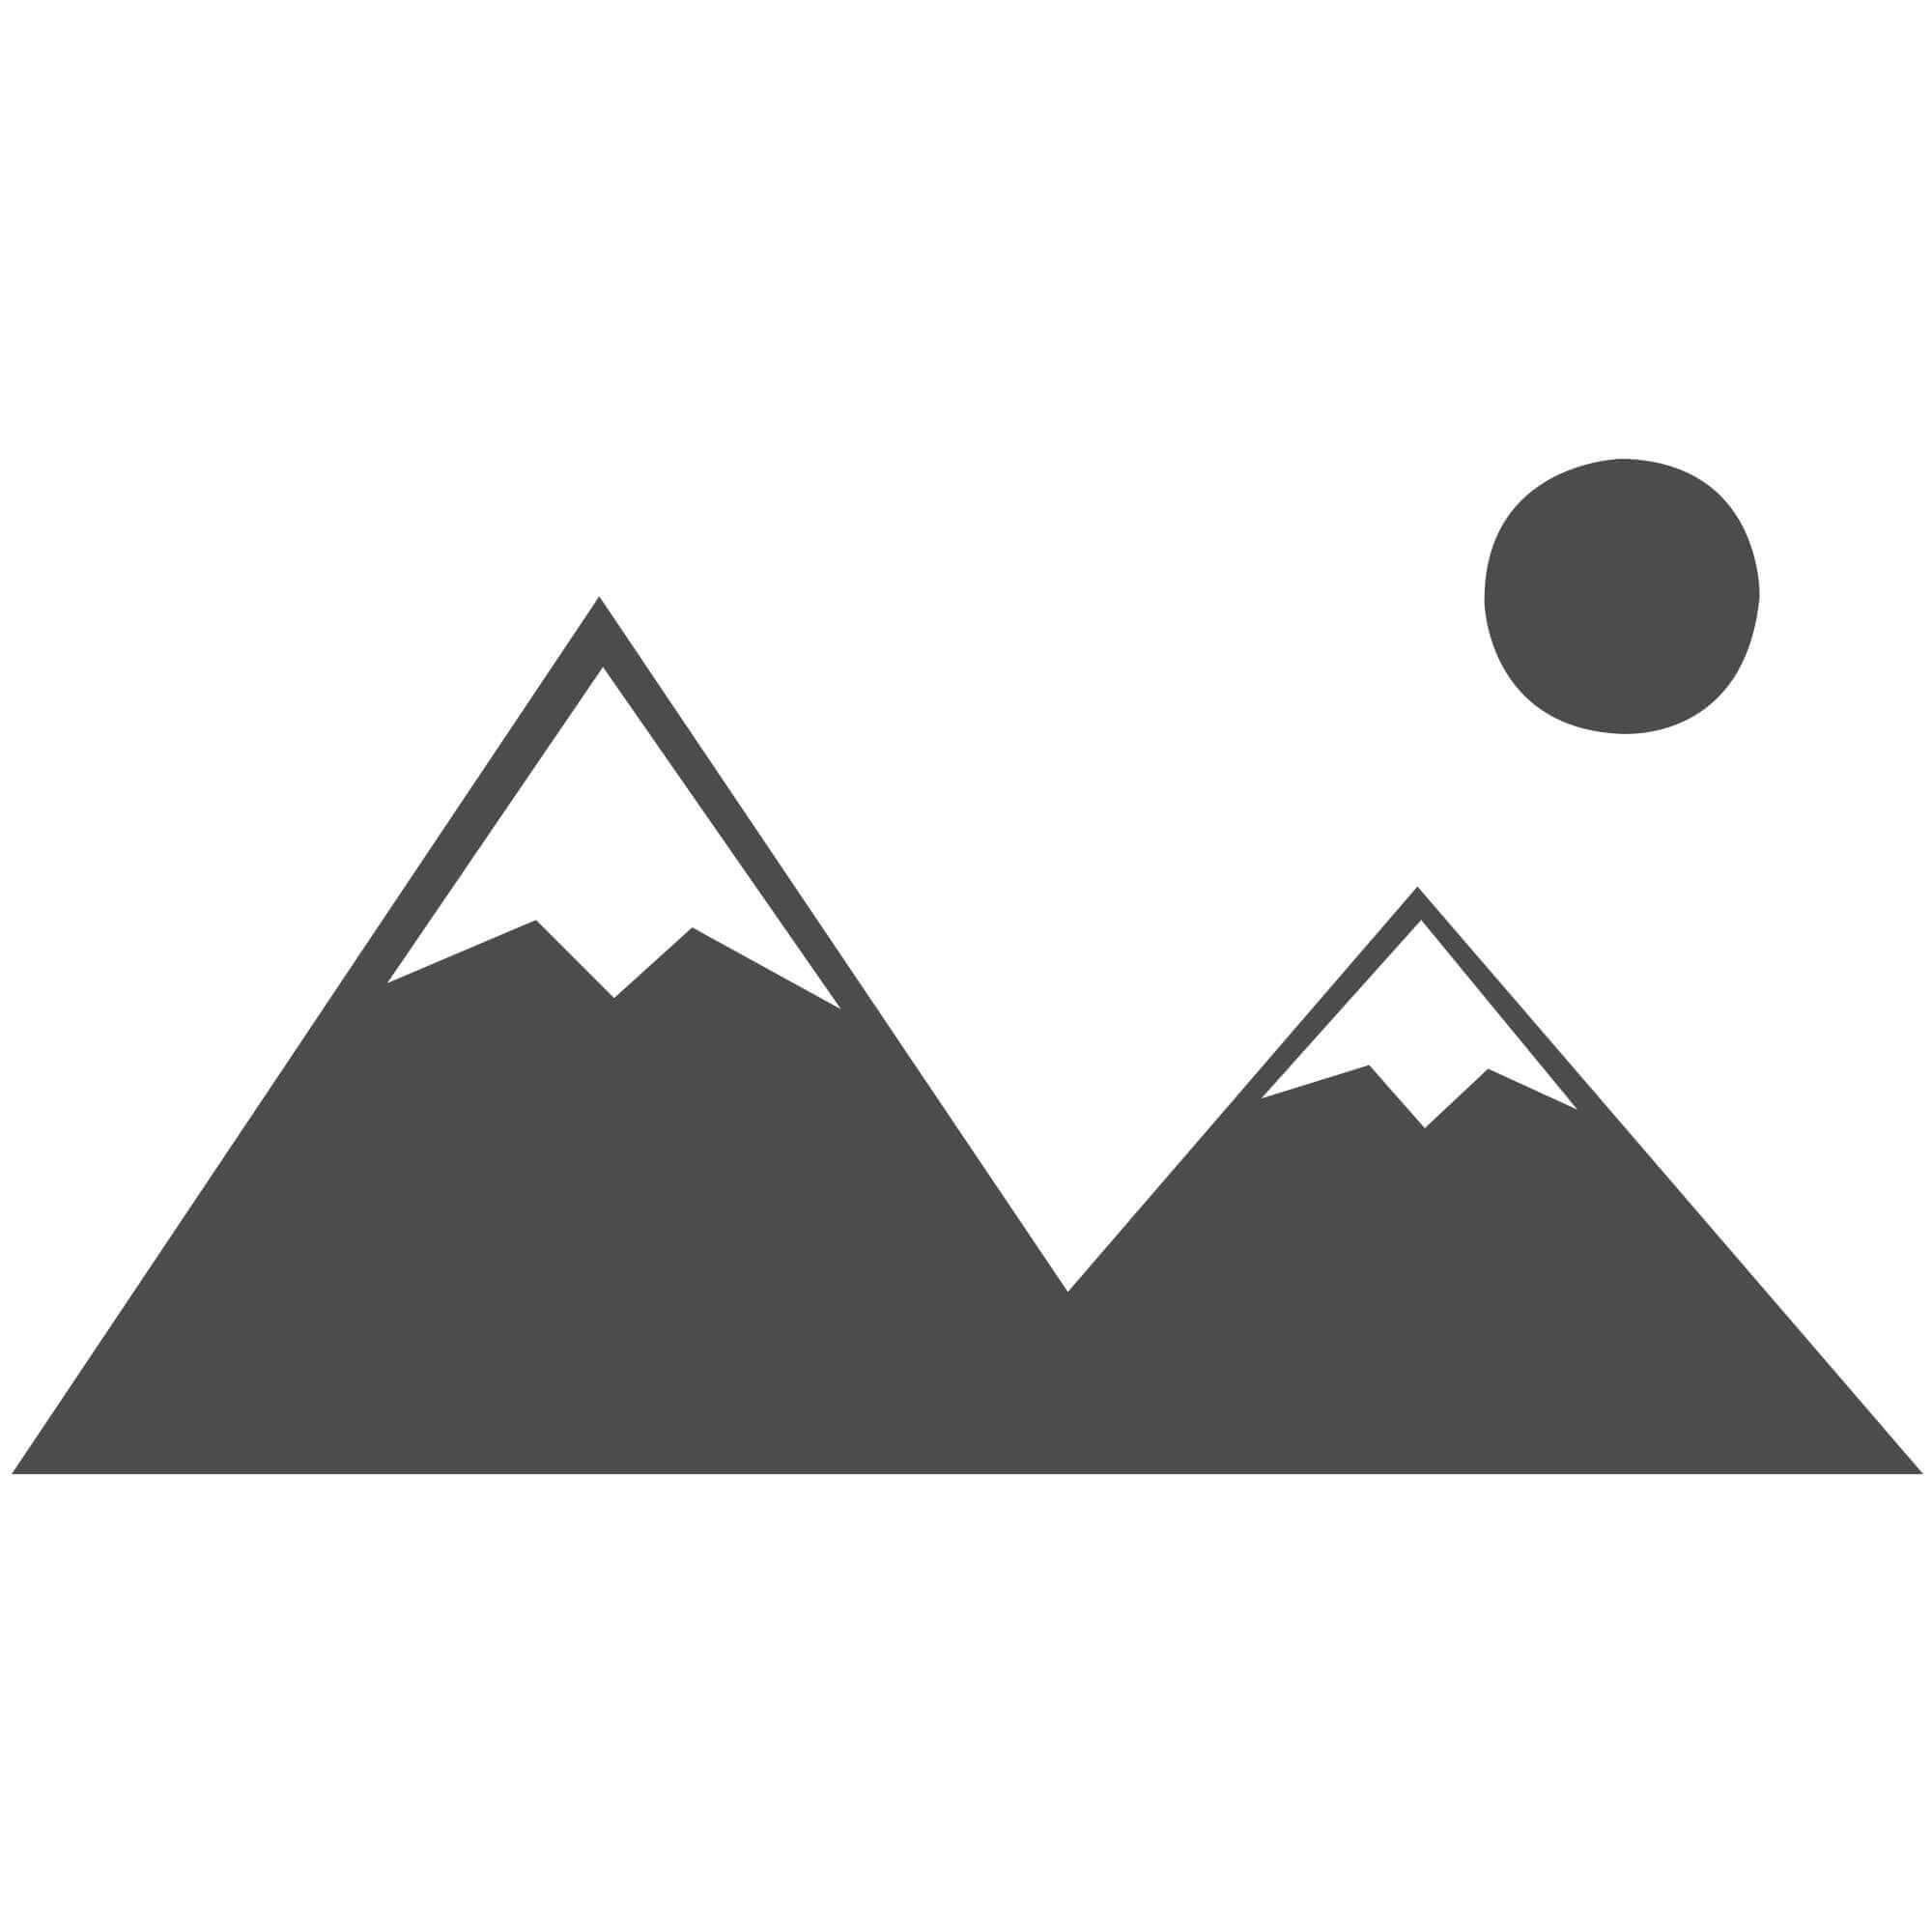 "Shatter Rug - Multi - Size 80 x 150 cm (2'8"" x 5')"